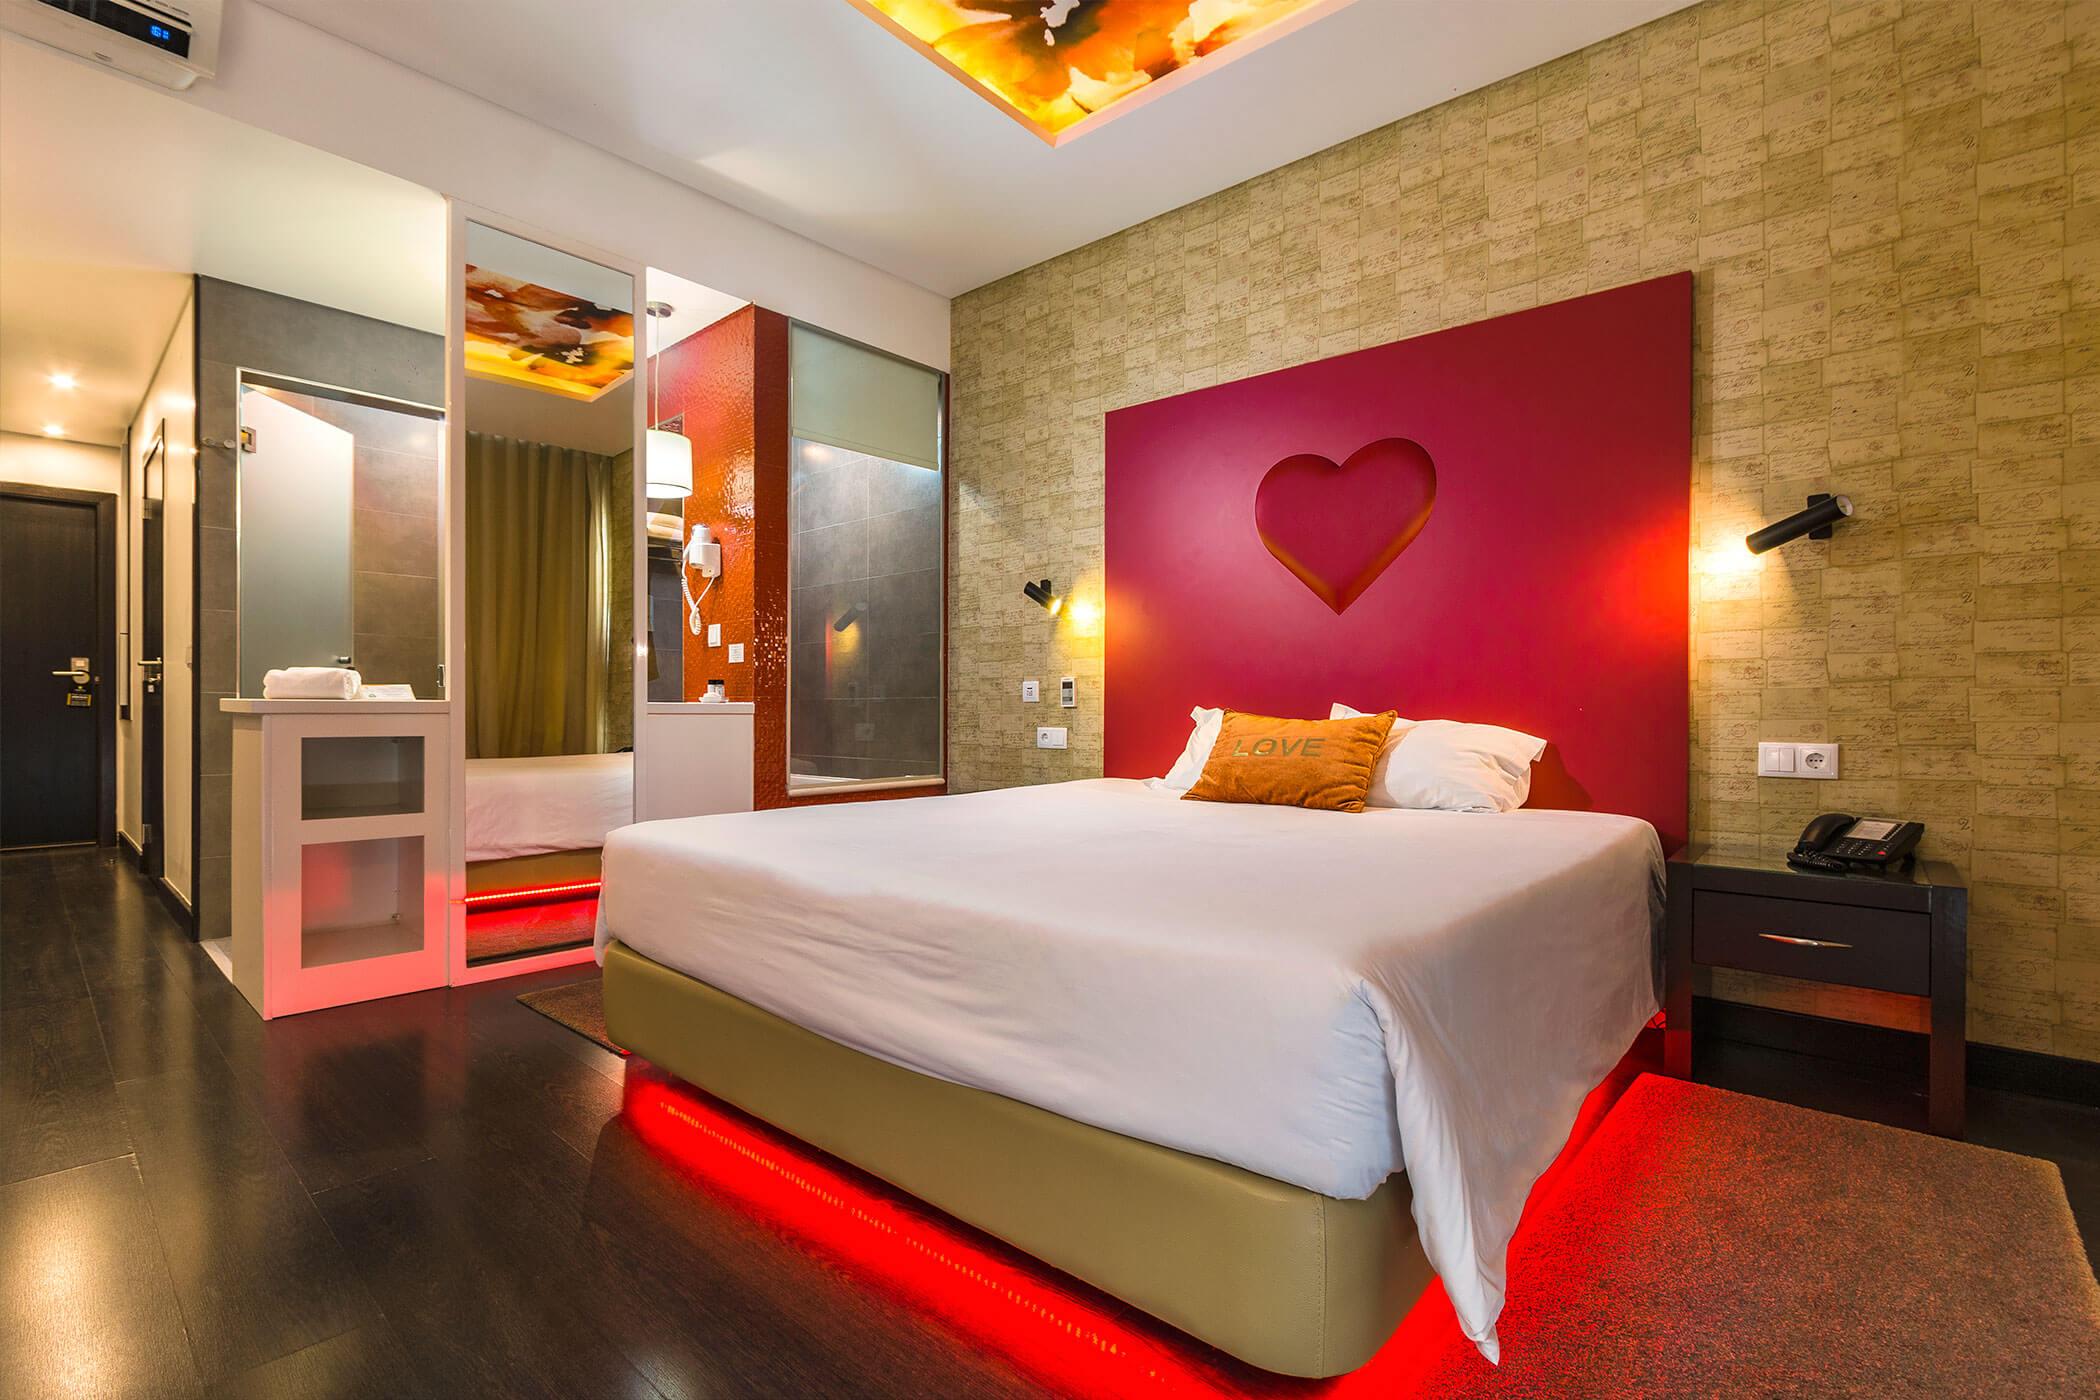 Standard Double Room Amor e Cegovim - Lisotel Hotel & Spa, Leiria